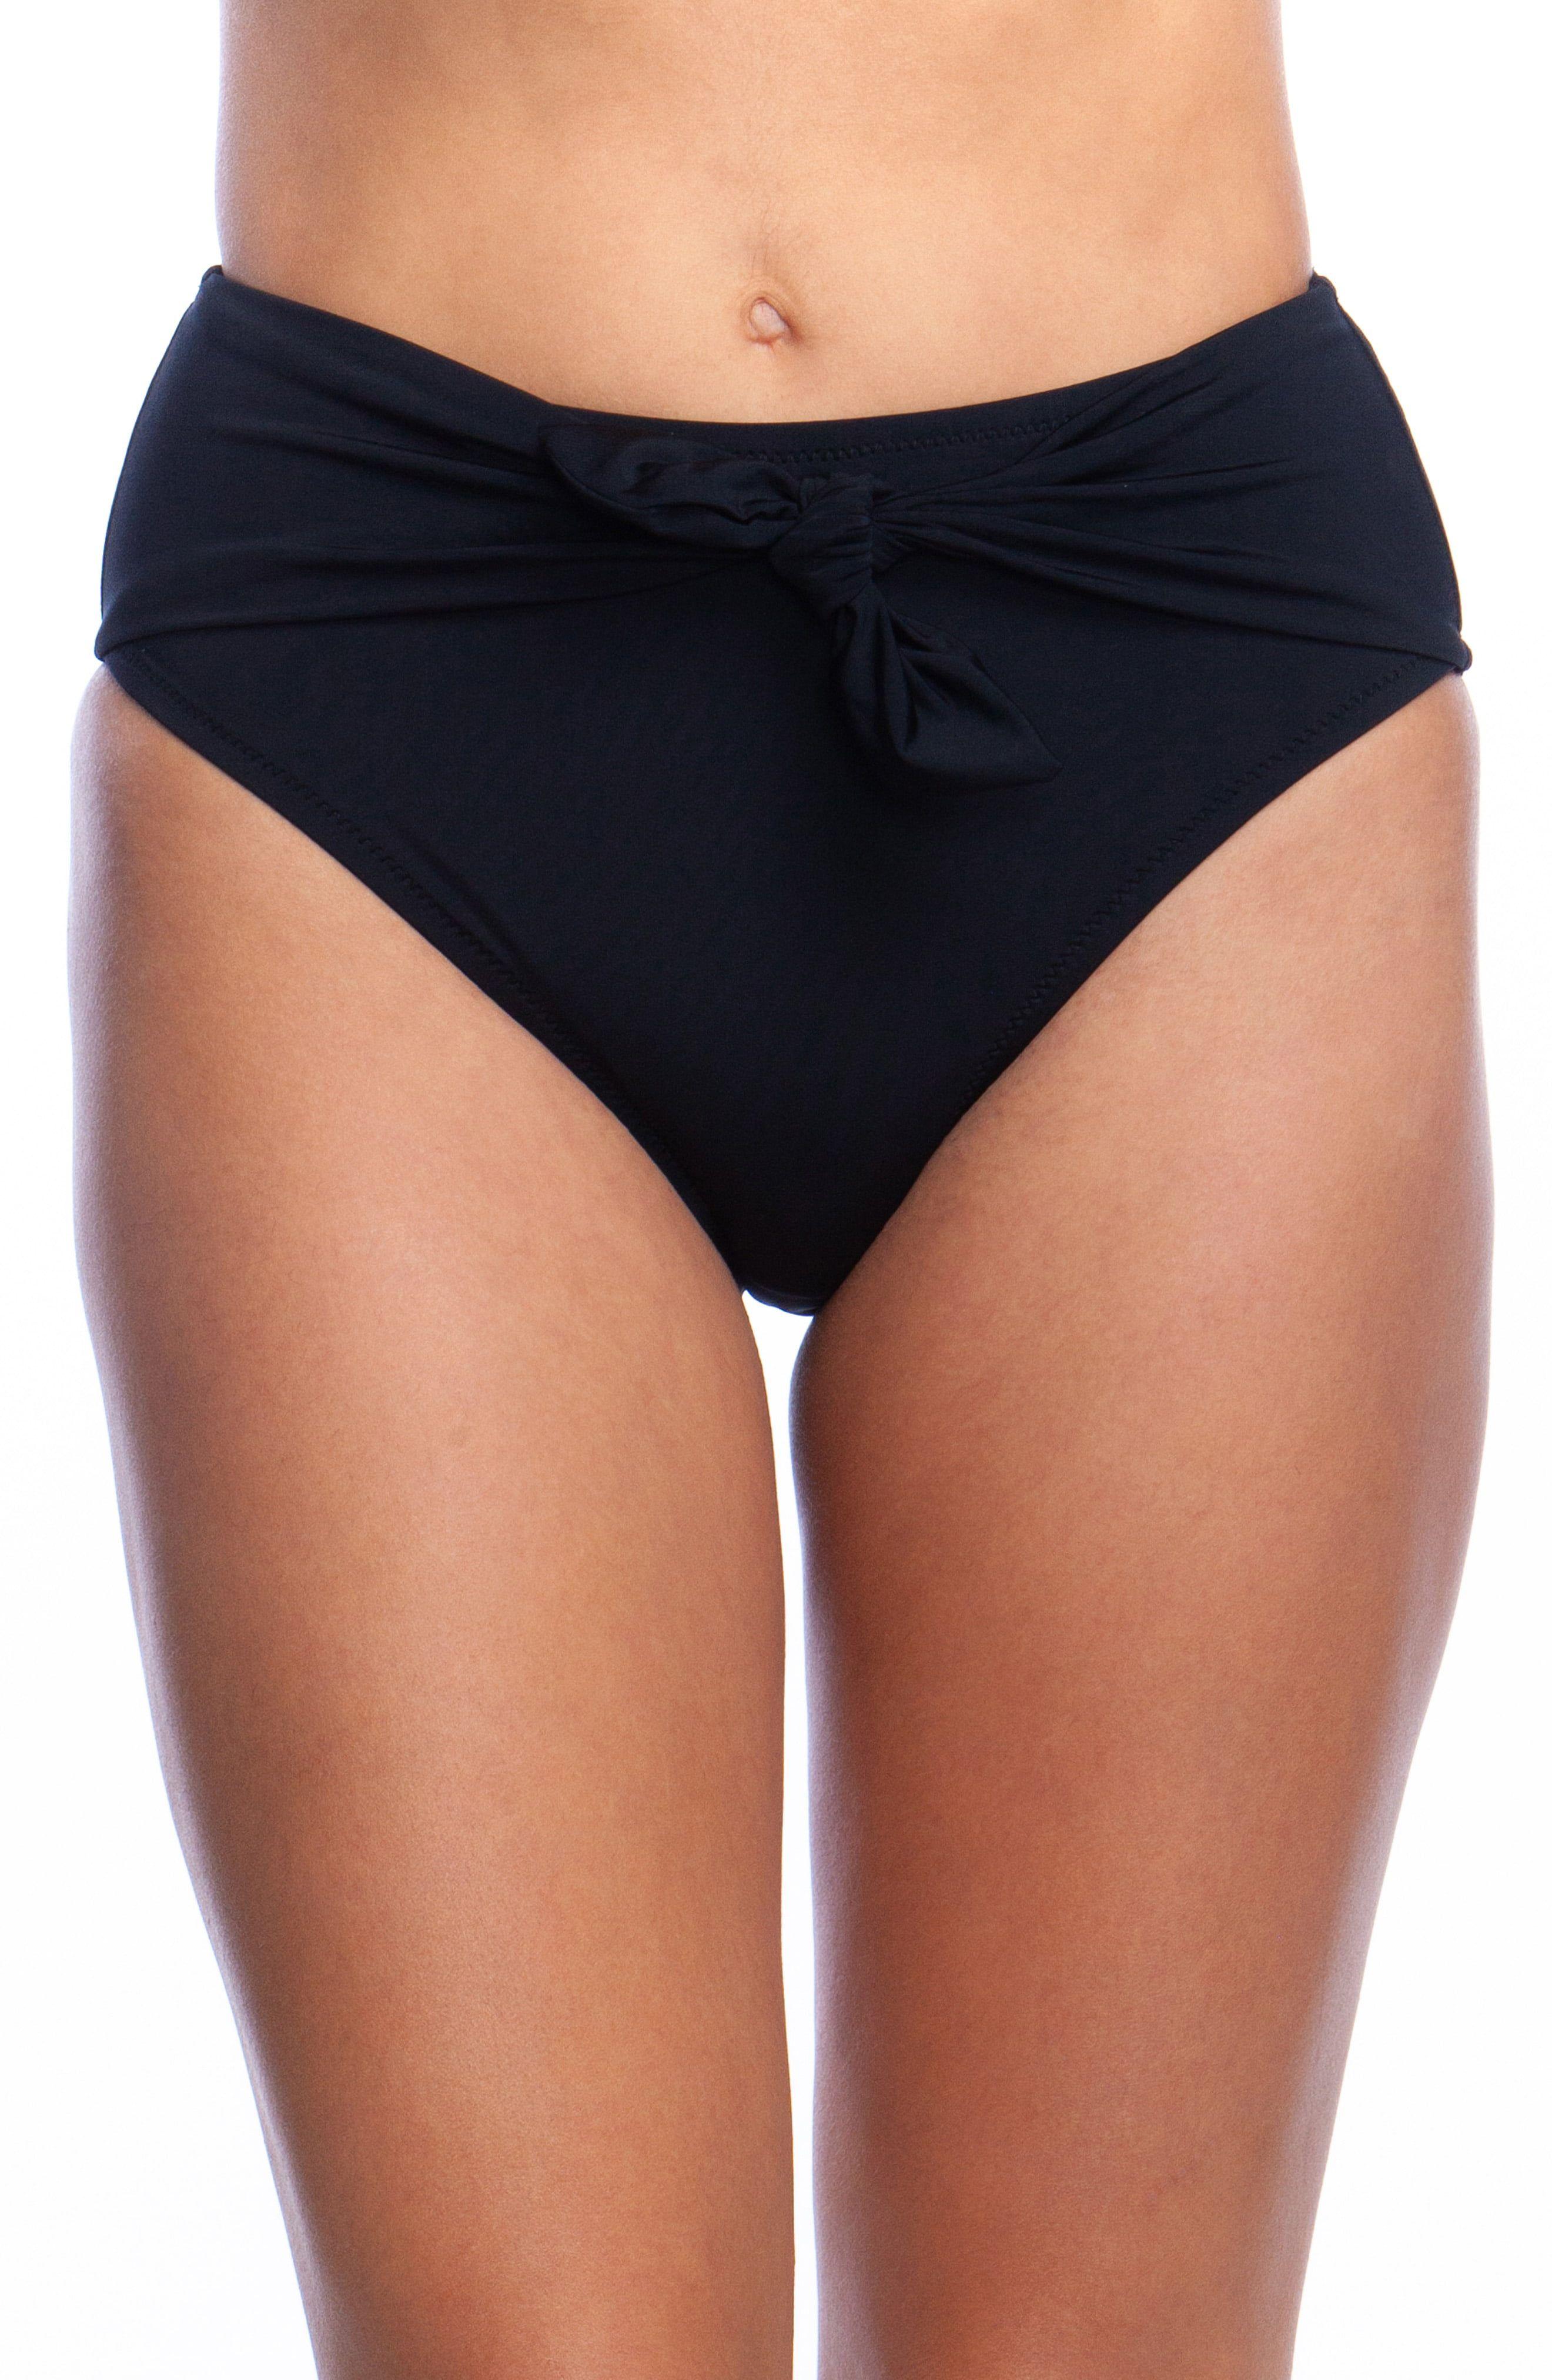 Slate reccomend Bath bikini sleepover swimsuit together underwear